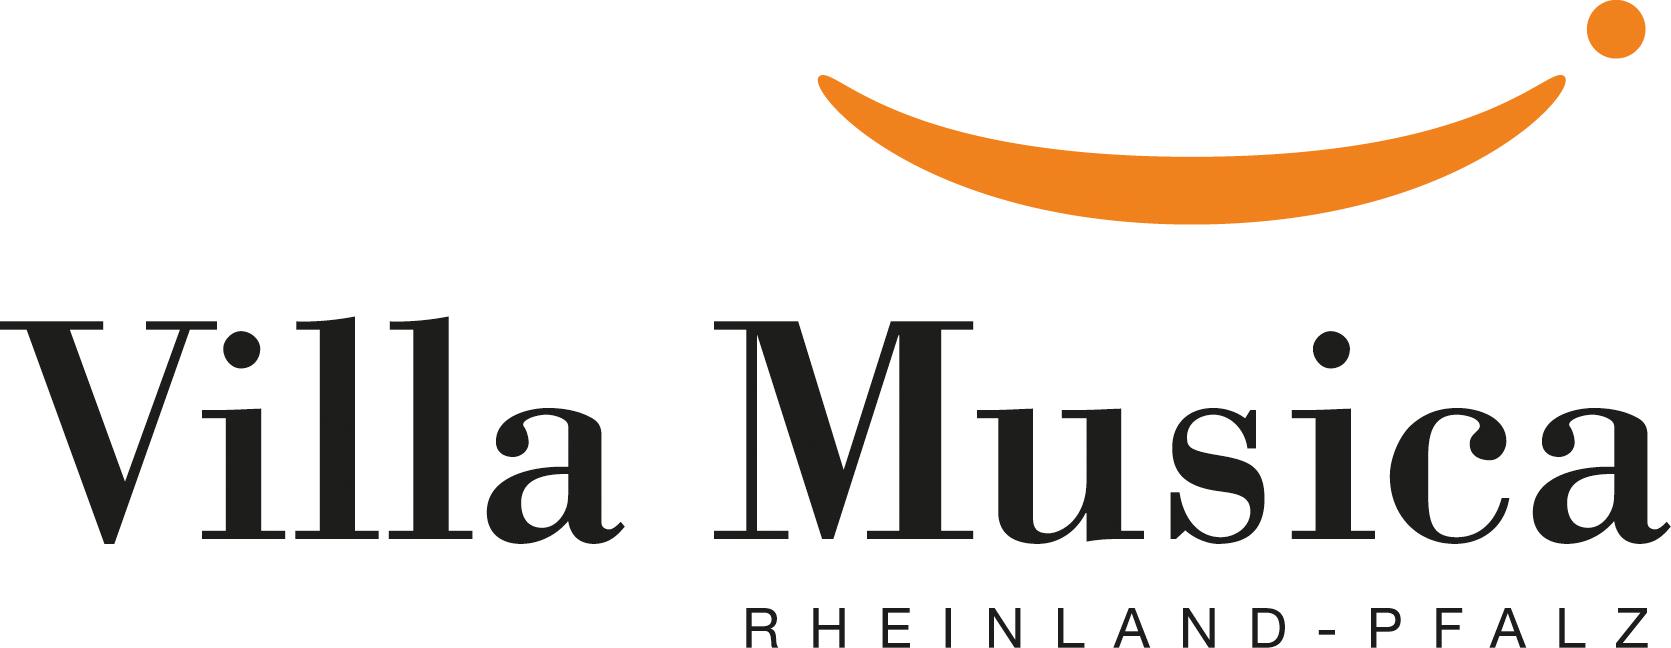 VillaMusica_logo_web.png